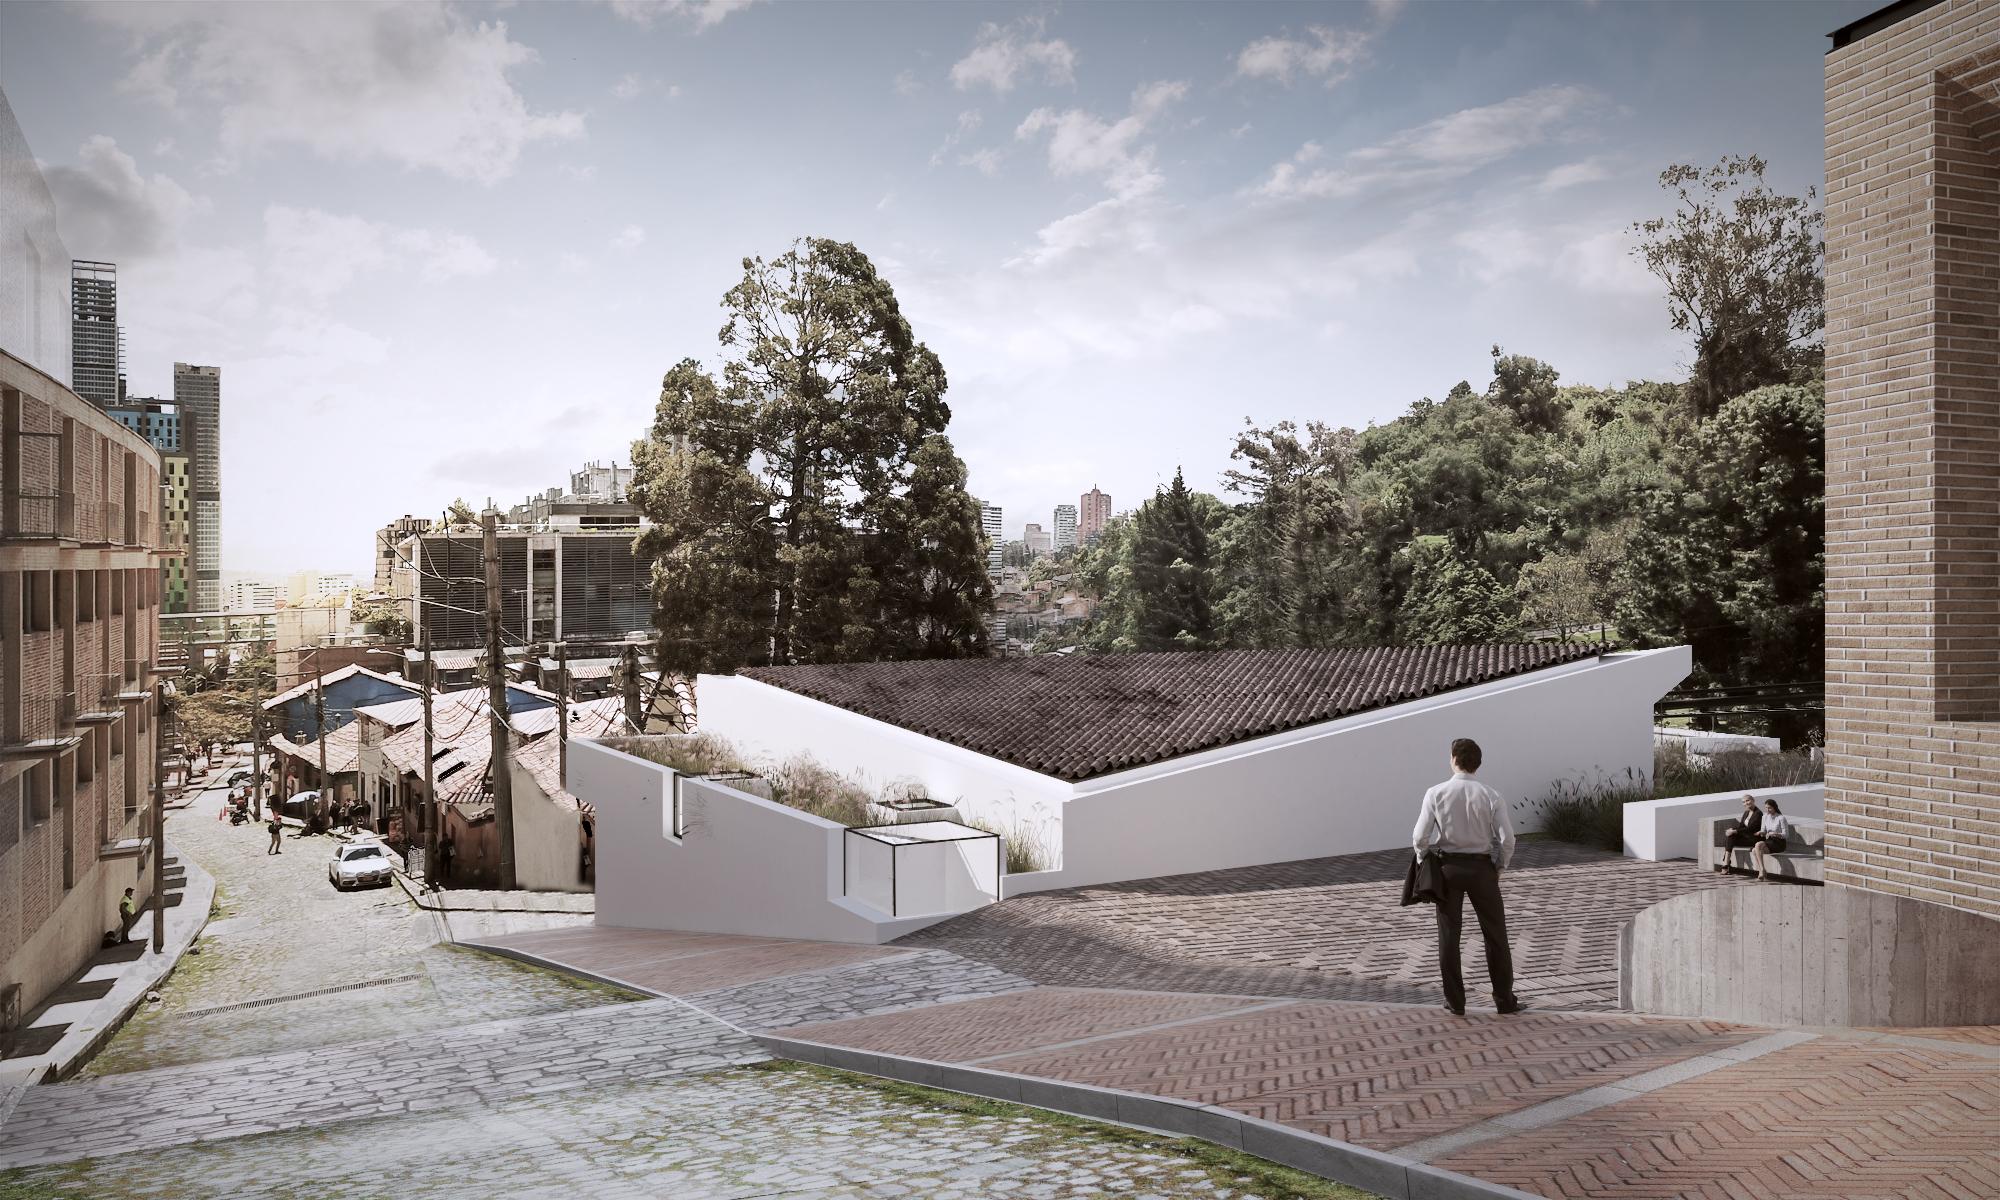 rir-arquitectos-uniandes-bolivariana-07.jpg